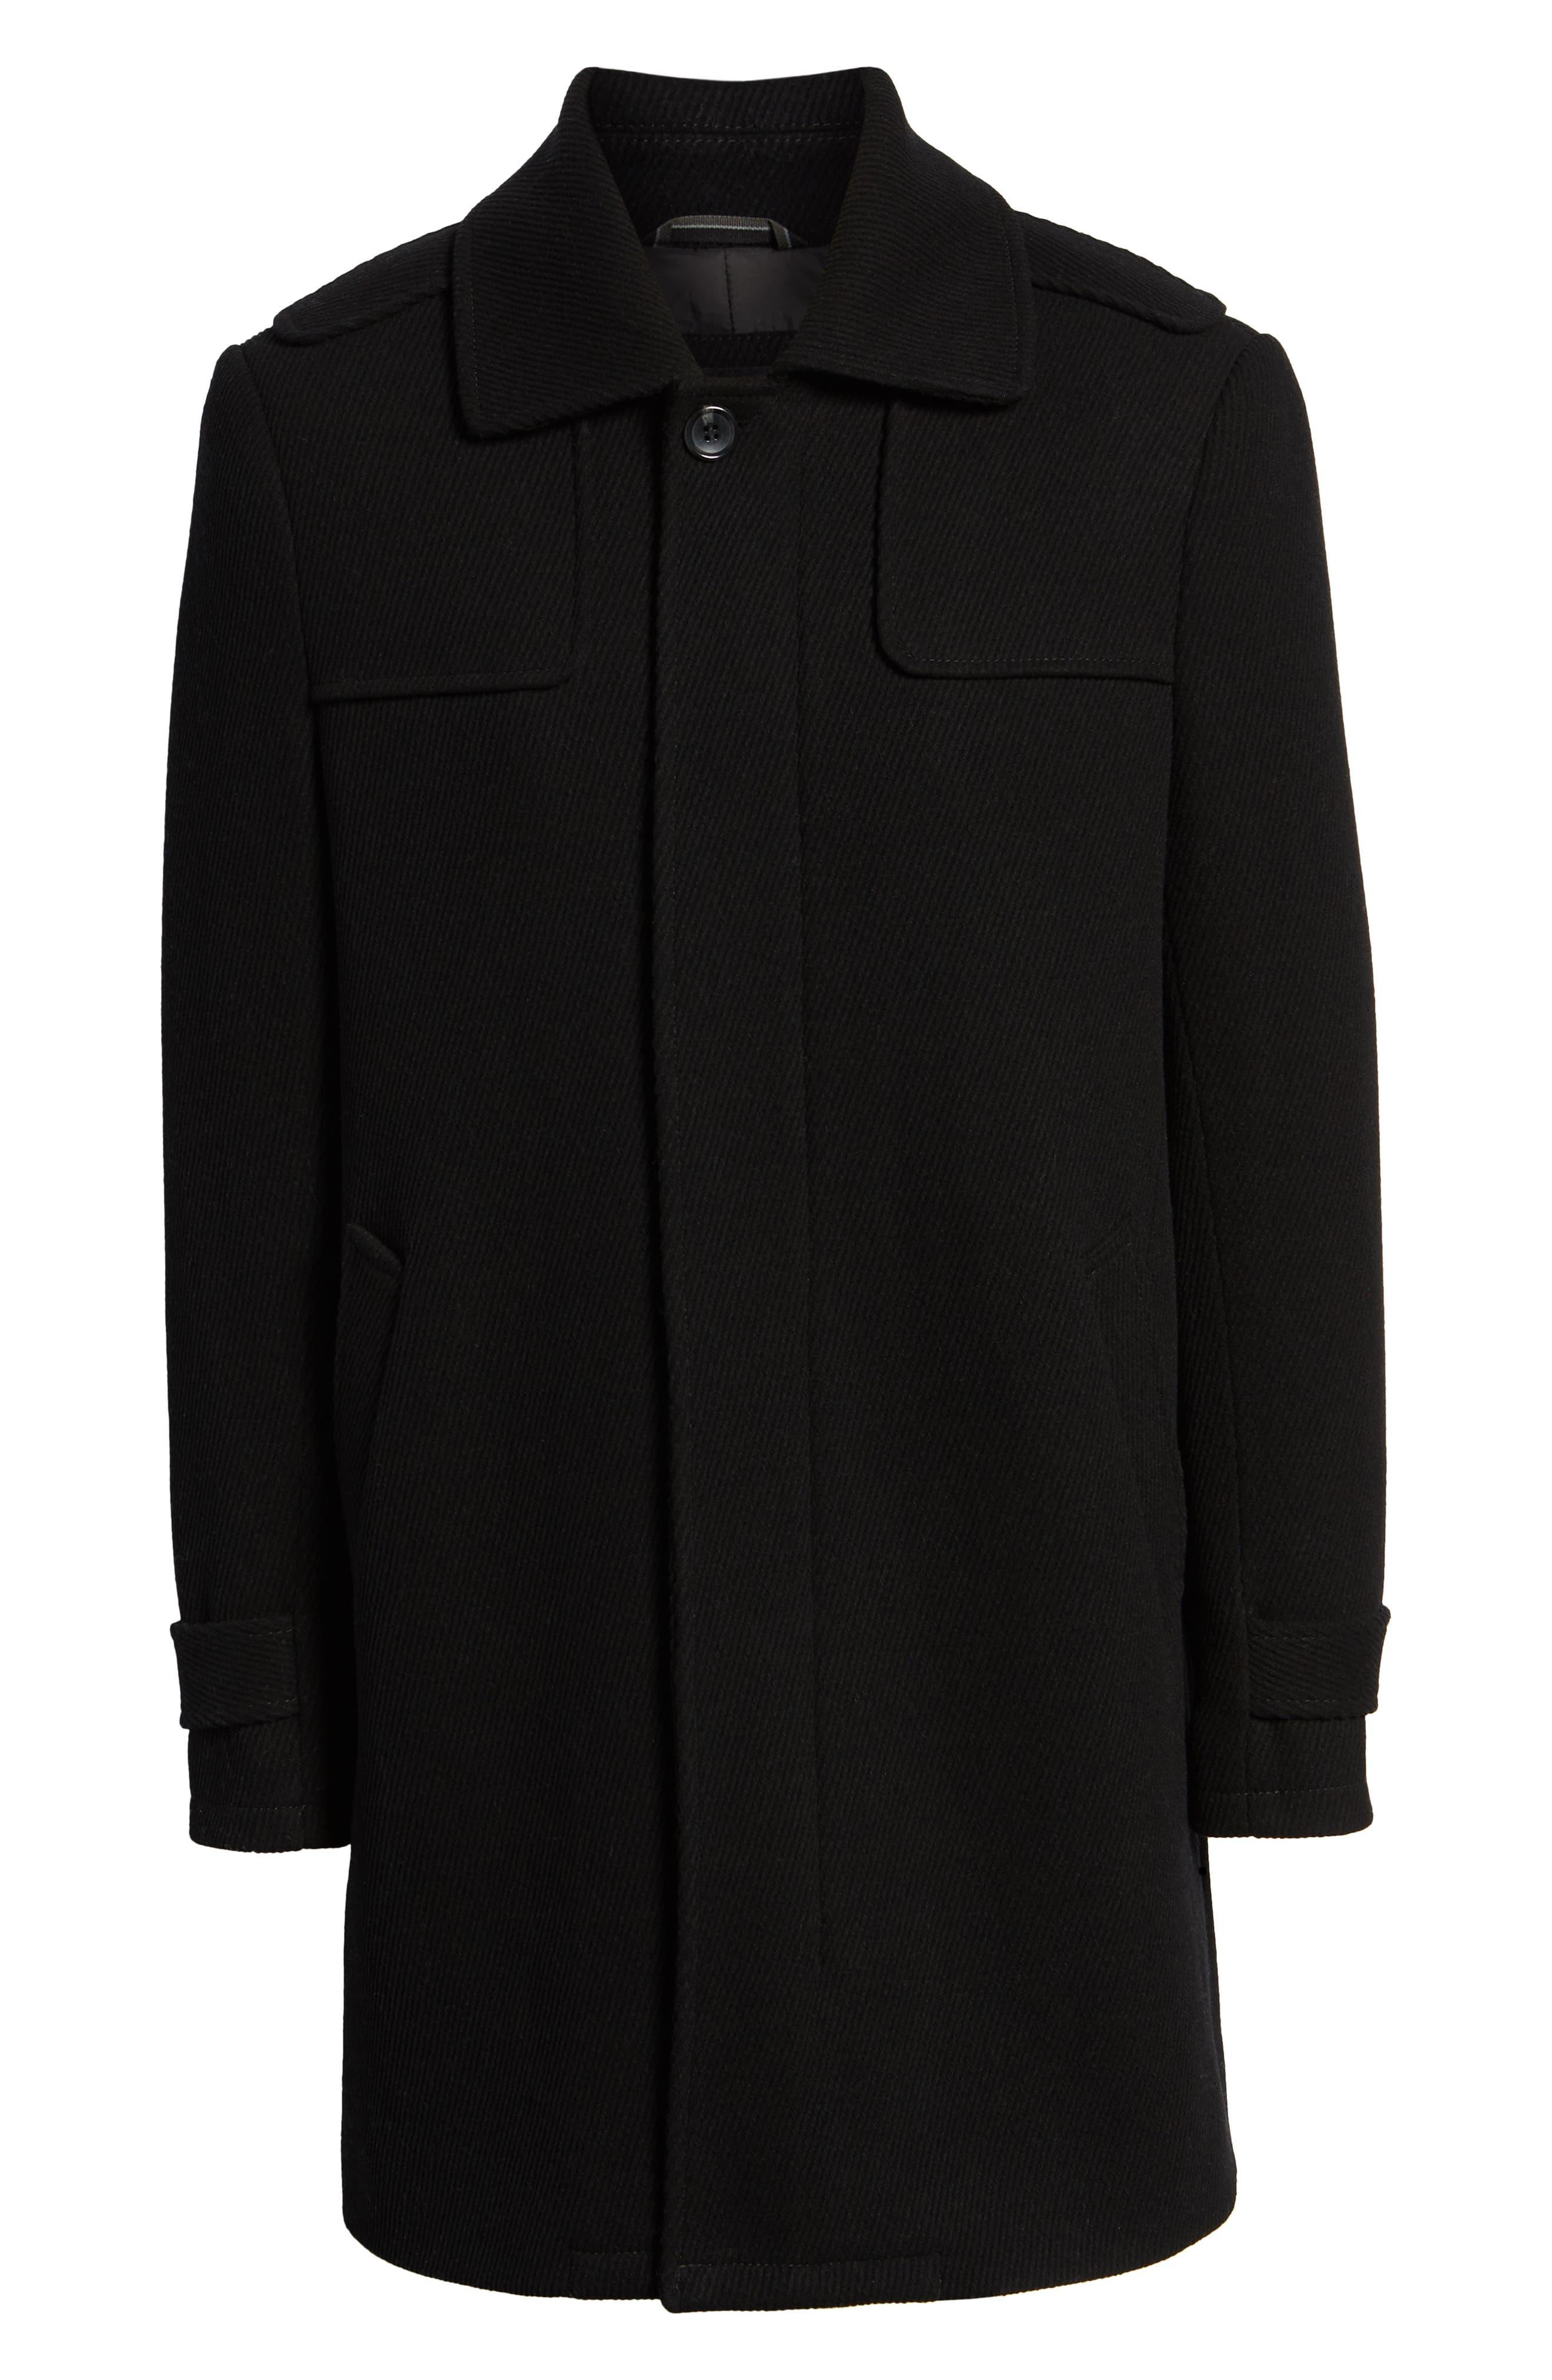 MARC NEW YORK, Edmund Wool Blend Twill Car Coat, Alternate thumbnail 5, color, BLACK